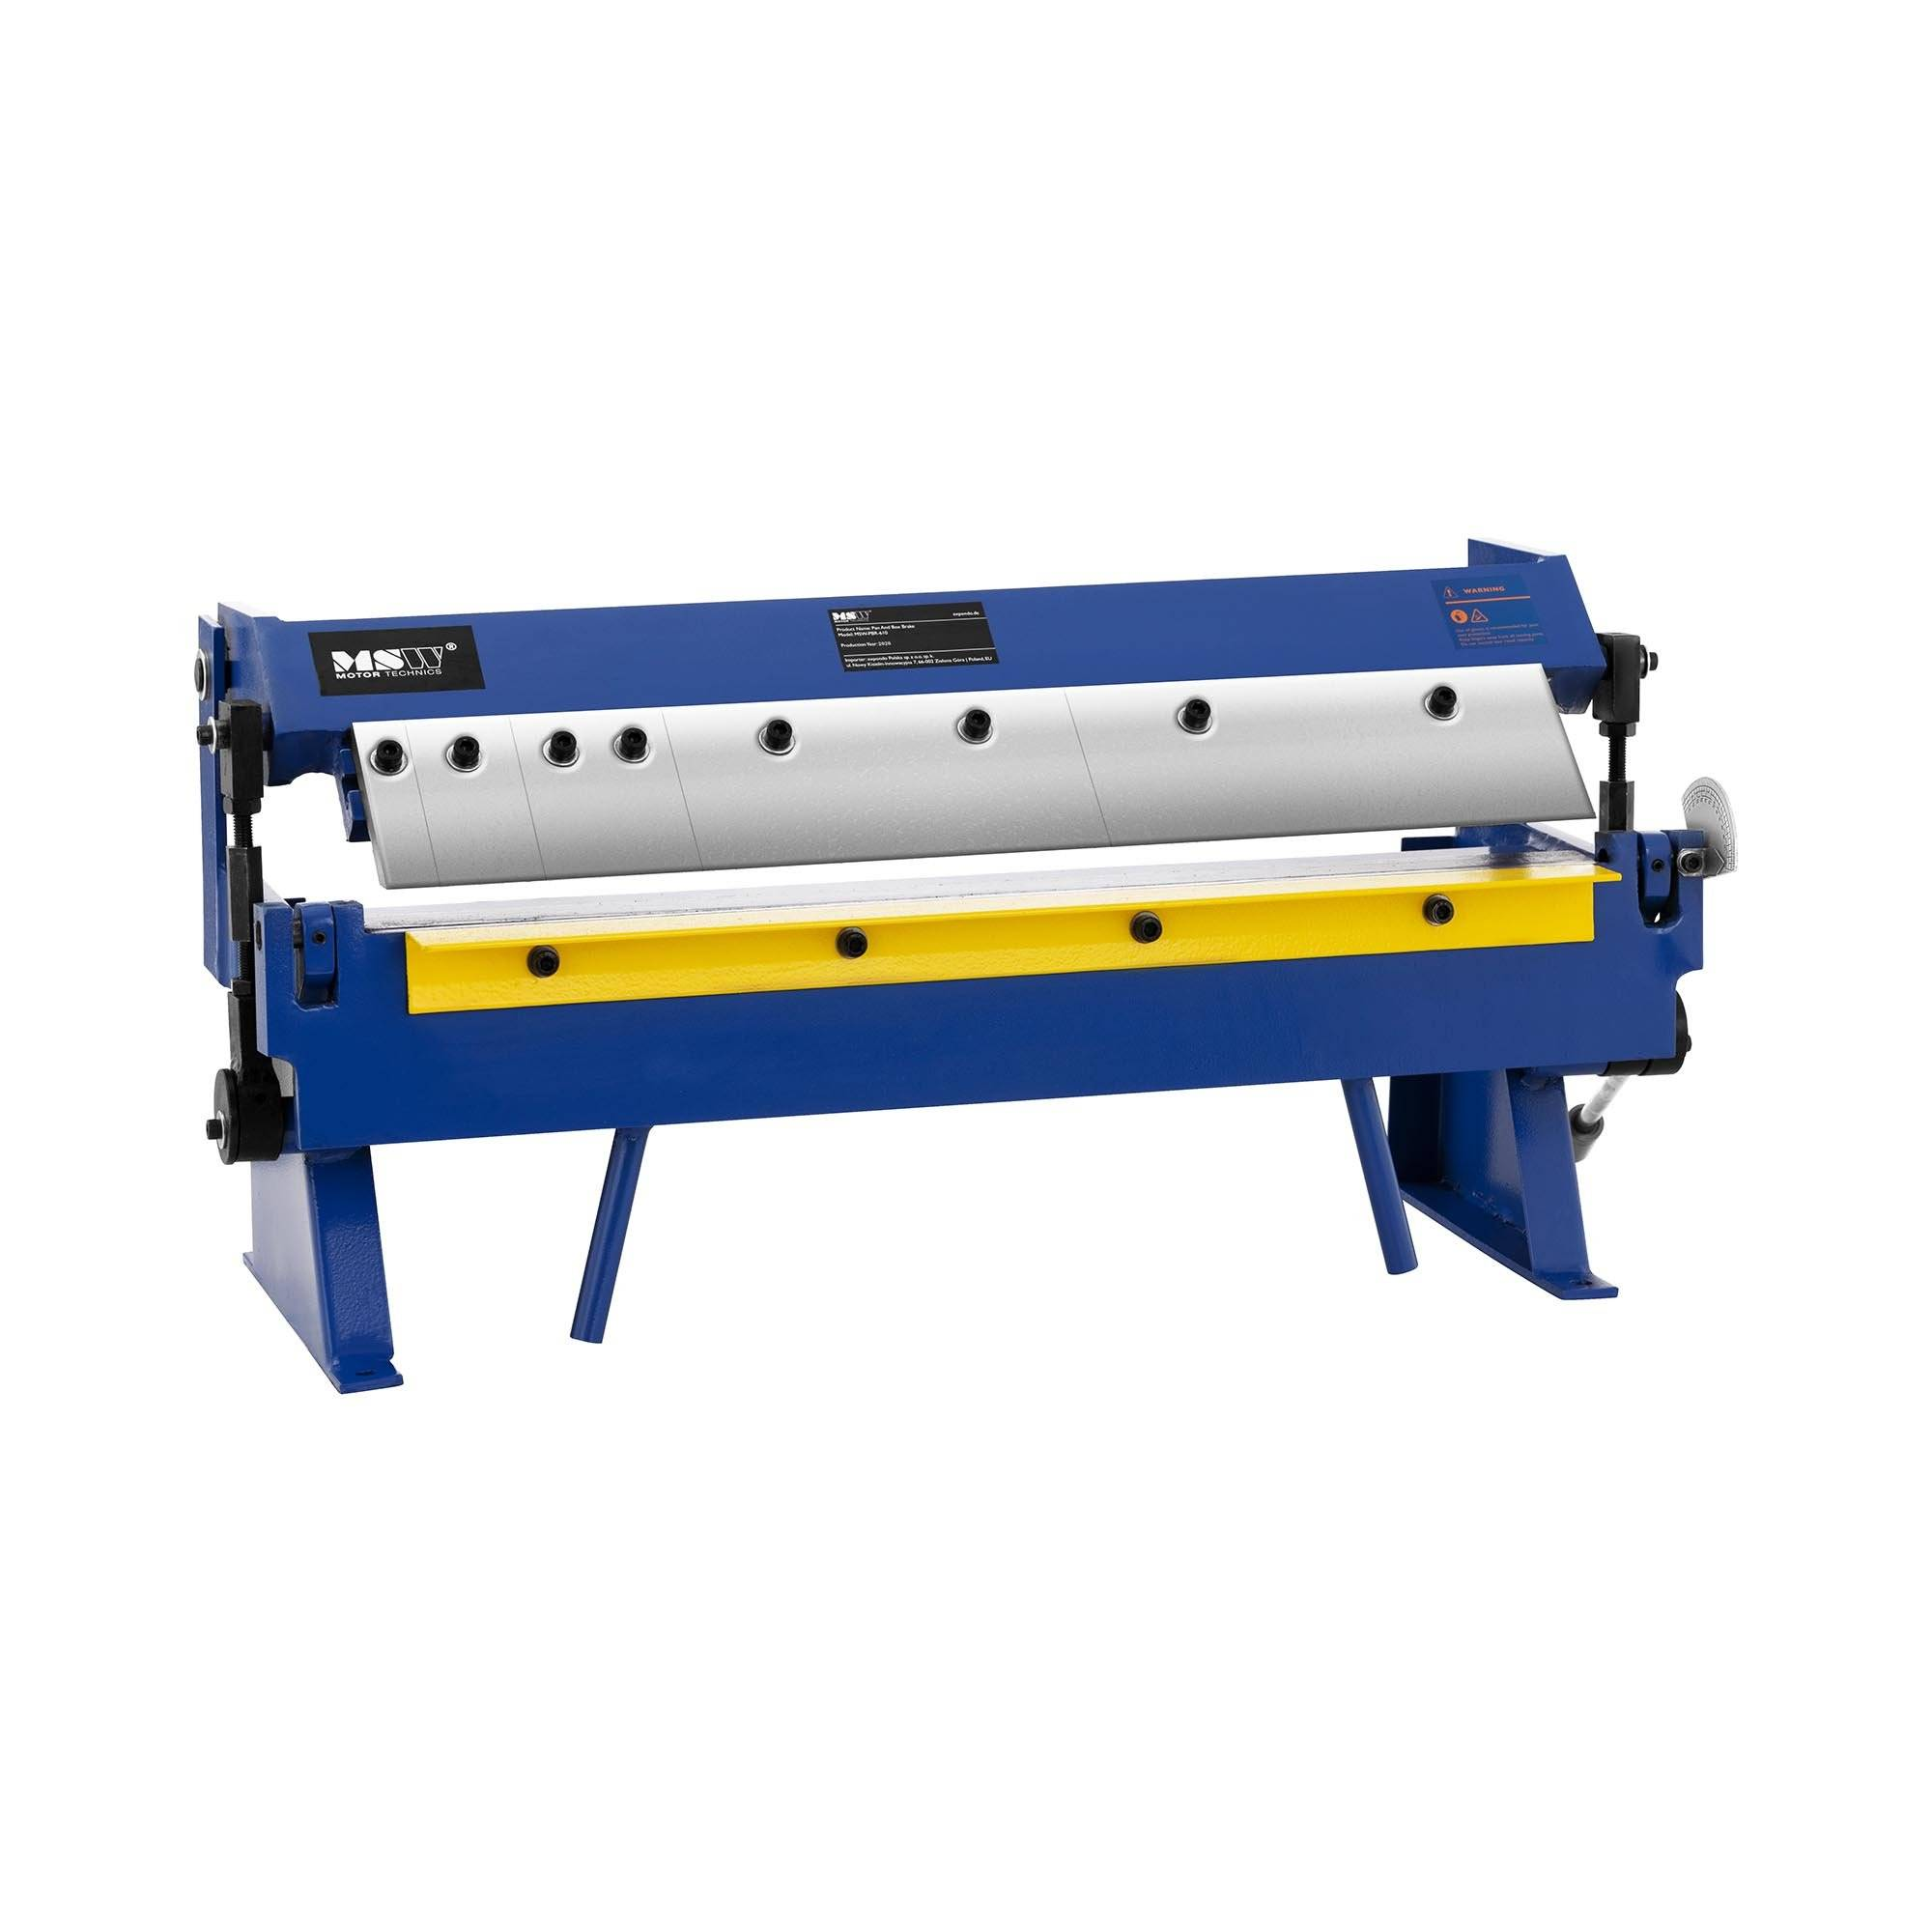 MSW Plateknekker - 610 mm - 0 til 135° - manuell 10061178